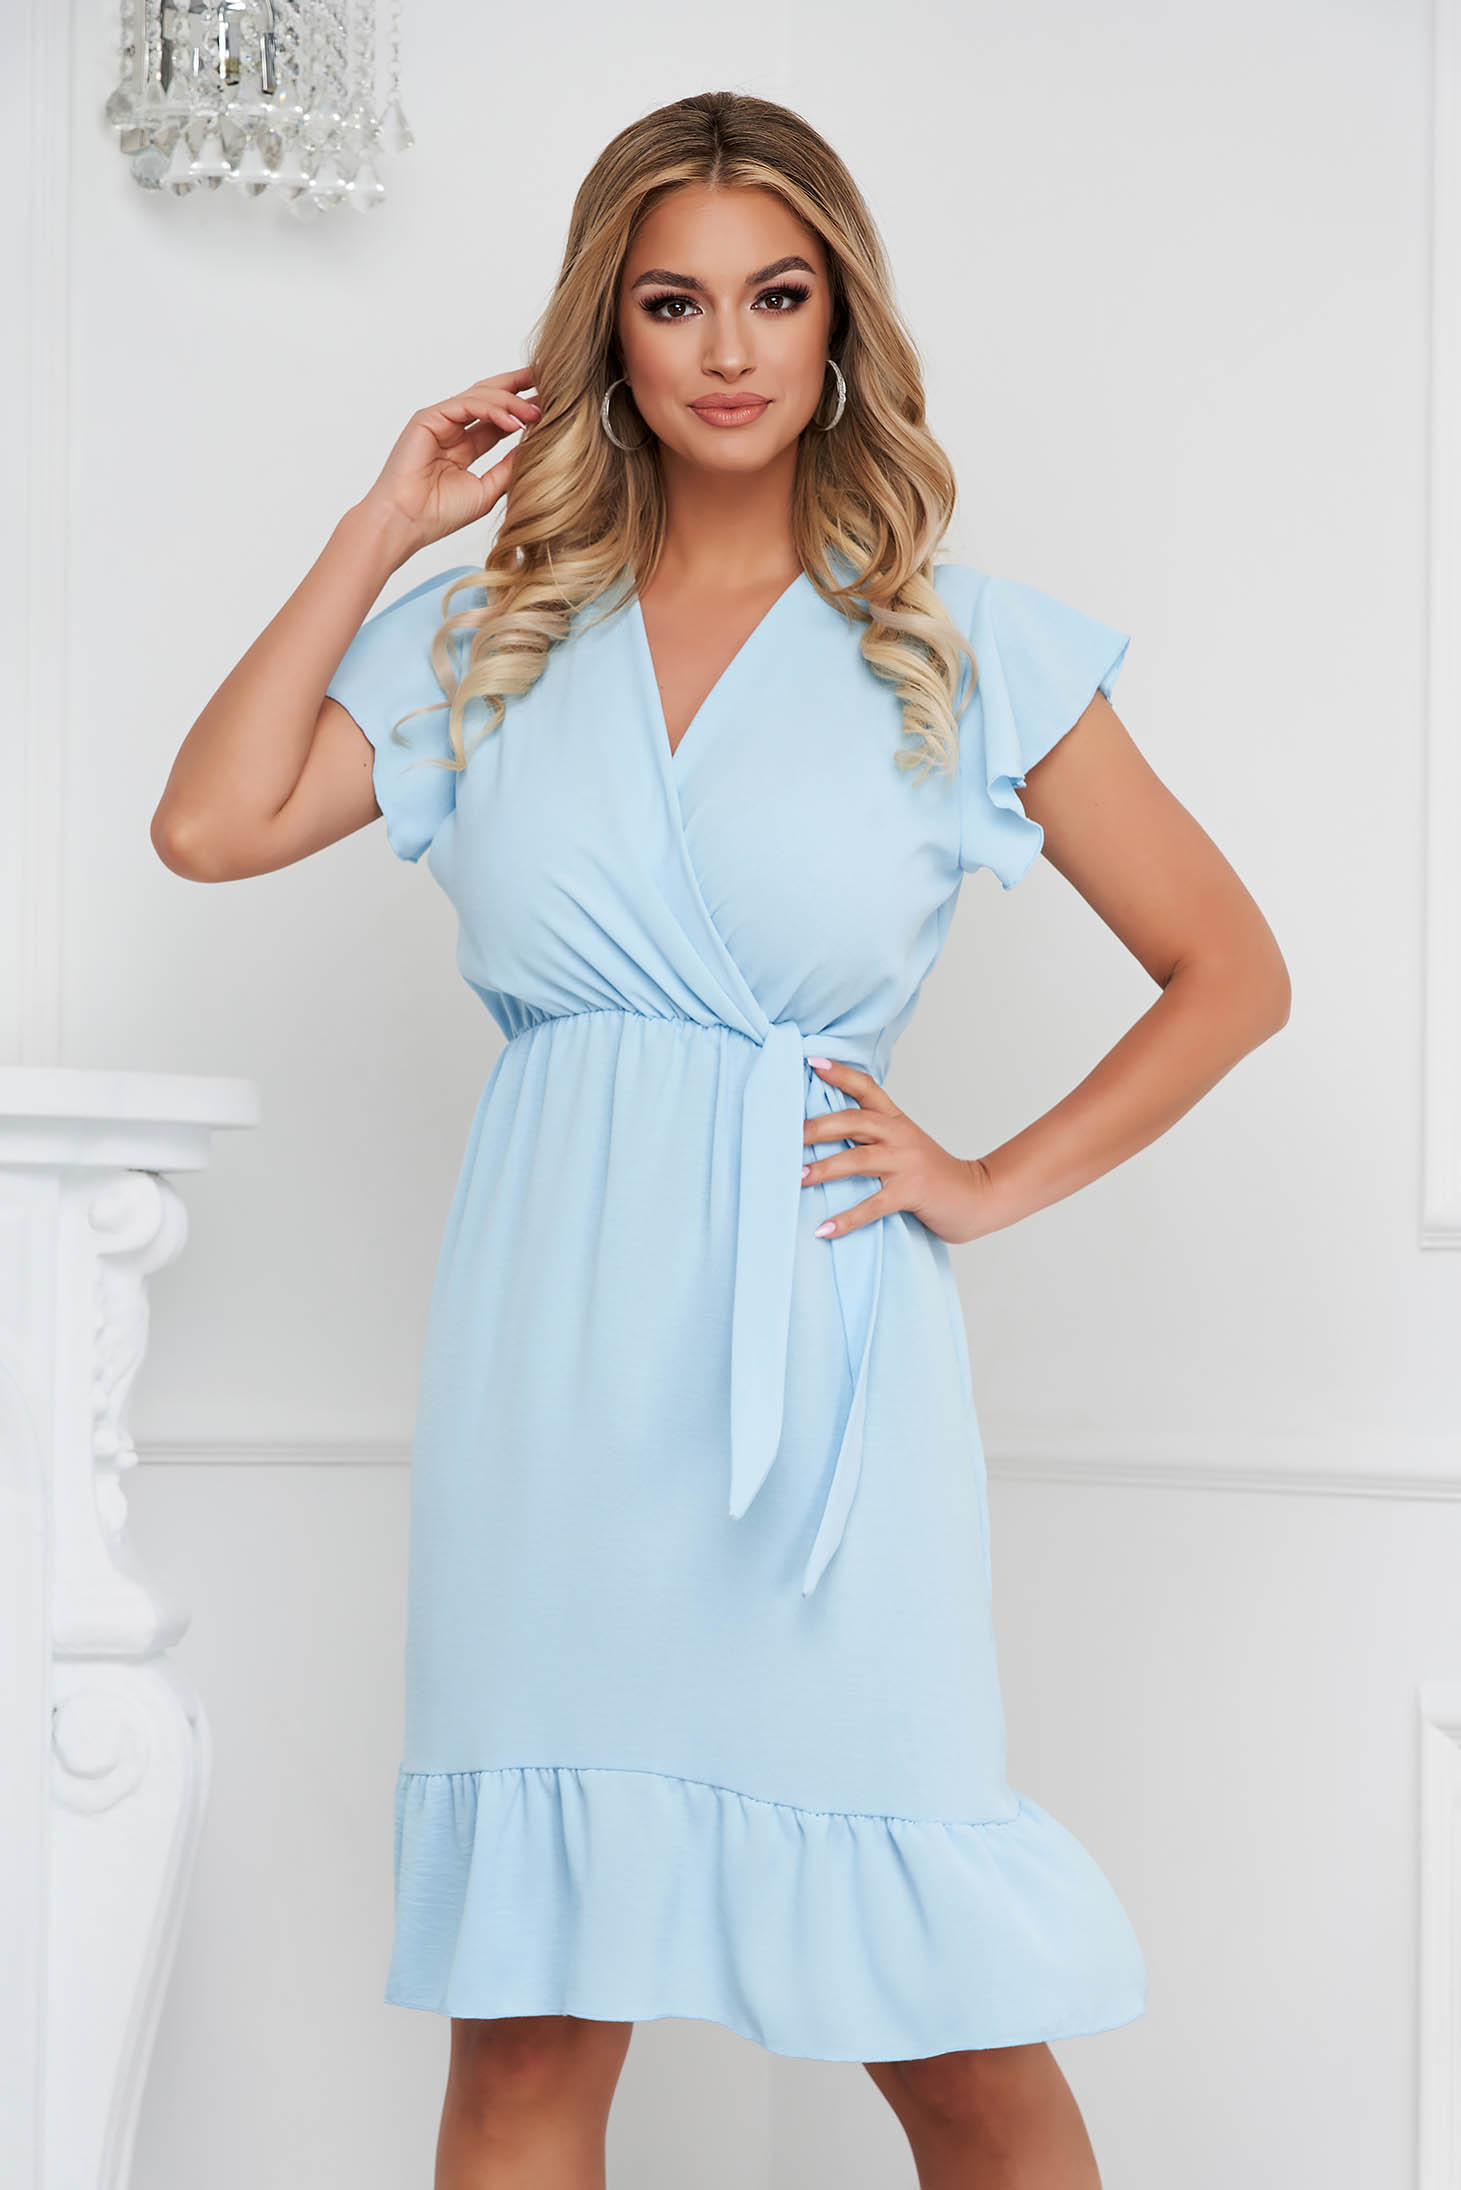 Lightblue dress midi cloche with elastic waist airy fabric with ruffle details